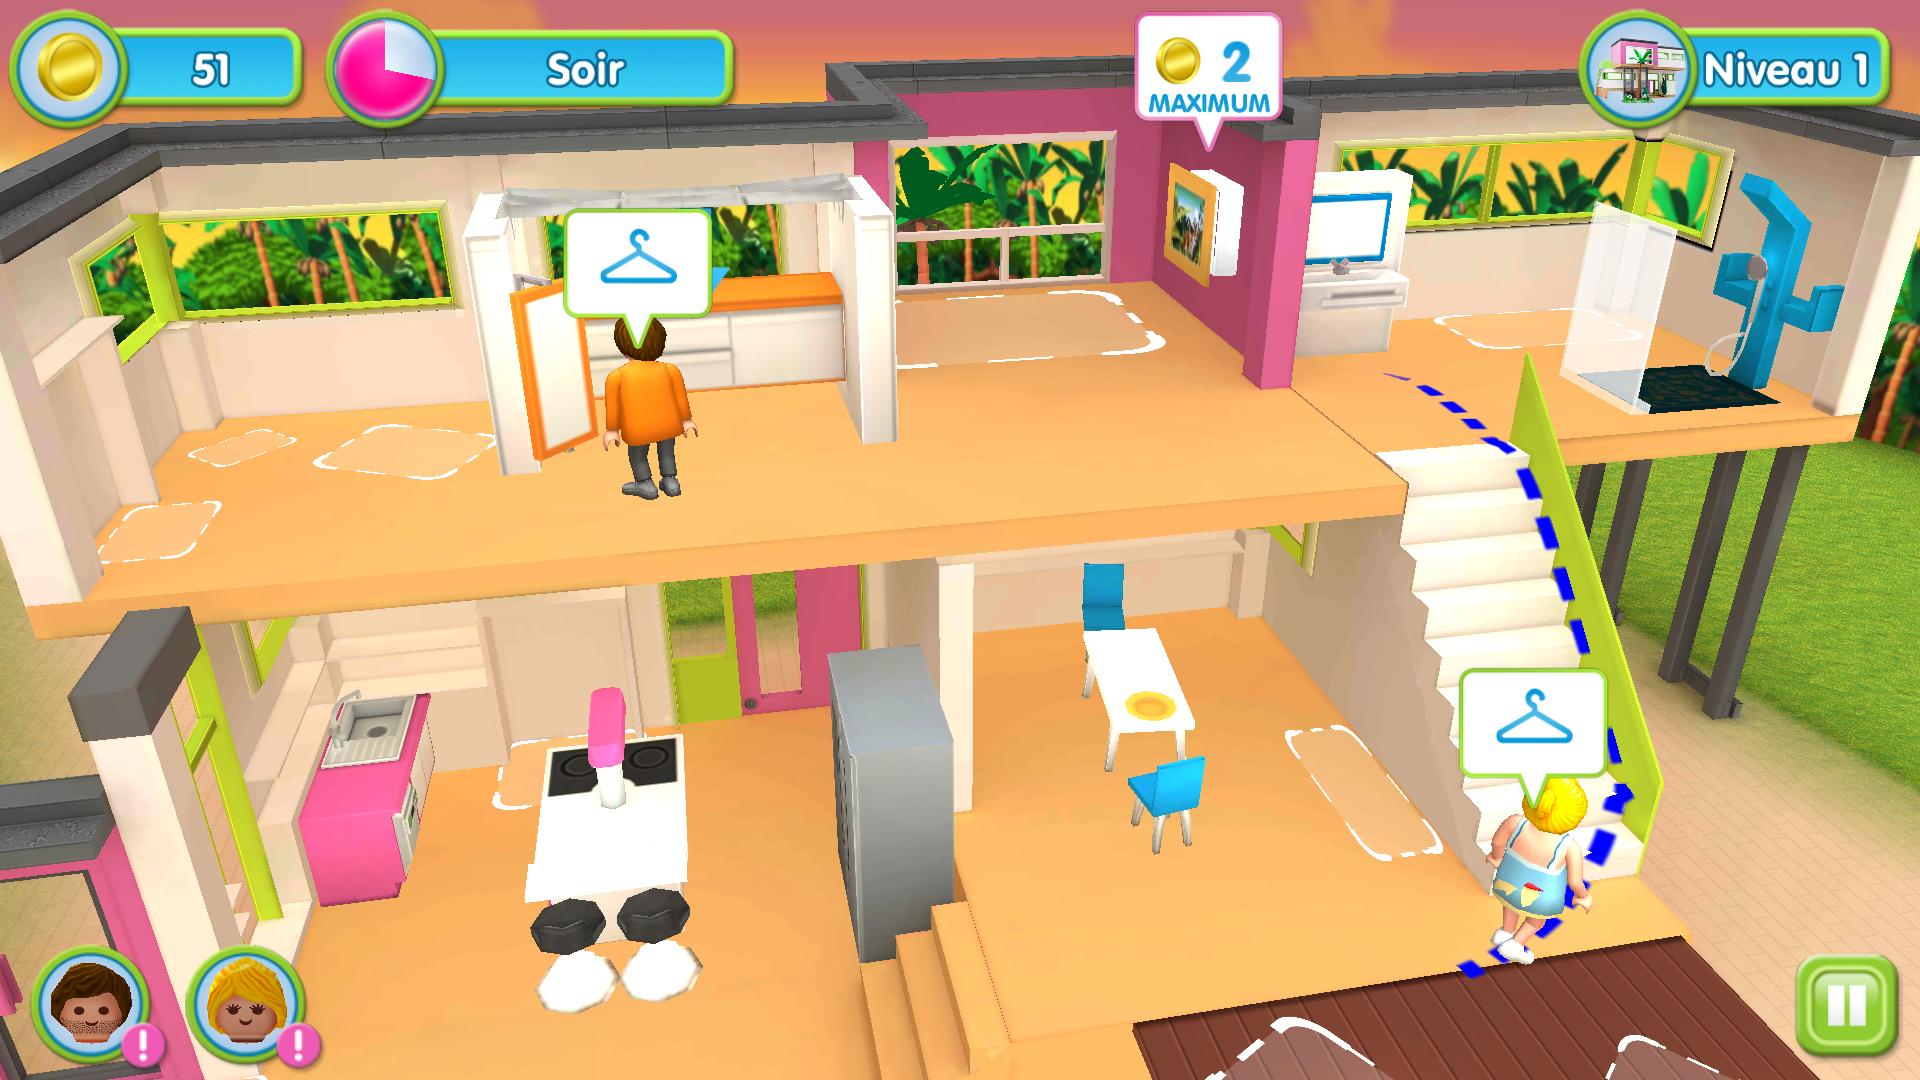 La maison moderne Playmobil Android 16/20 (test, photos)